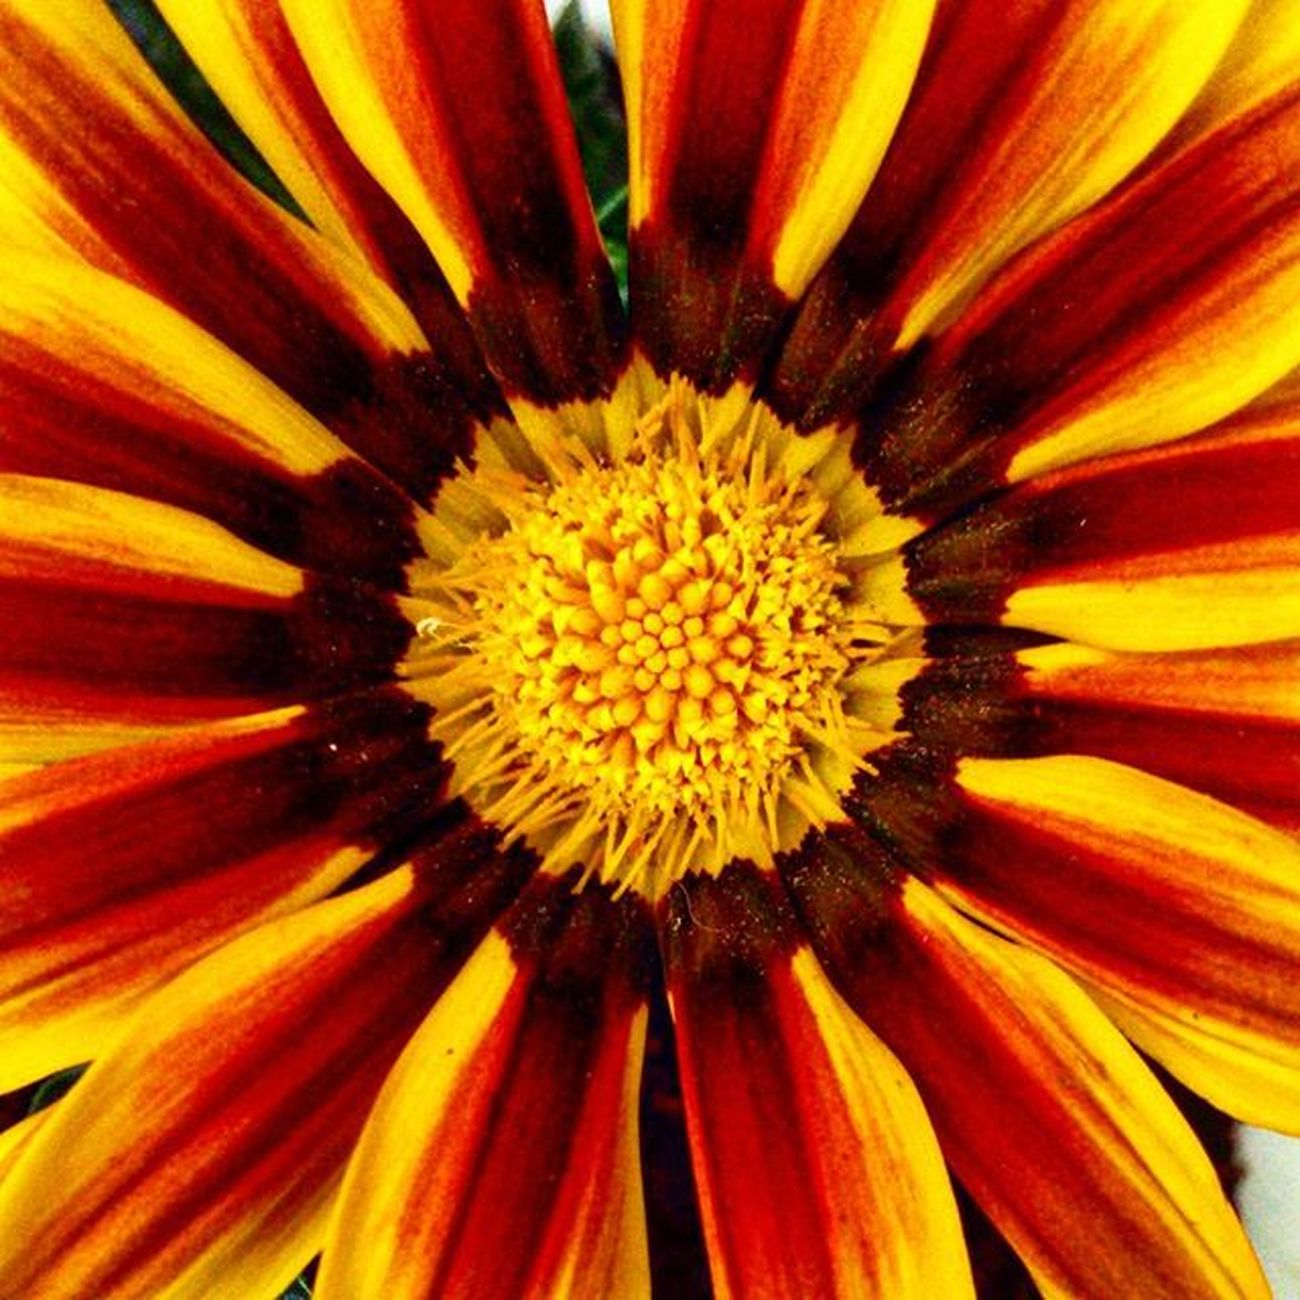 🌻🍃 Bomdia Flor Flowers Instaflower Image_gram Yellow Red Beautiful Fotododia Naturezaperfeita Soulnature_ Quintaflower